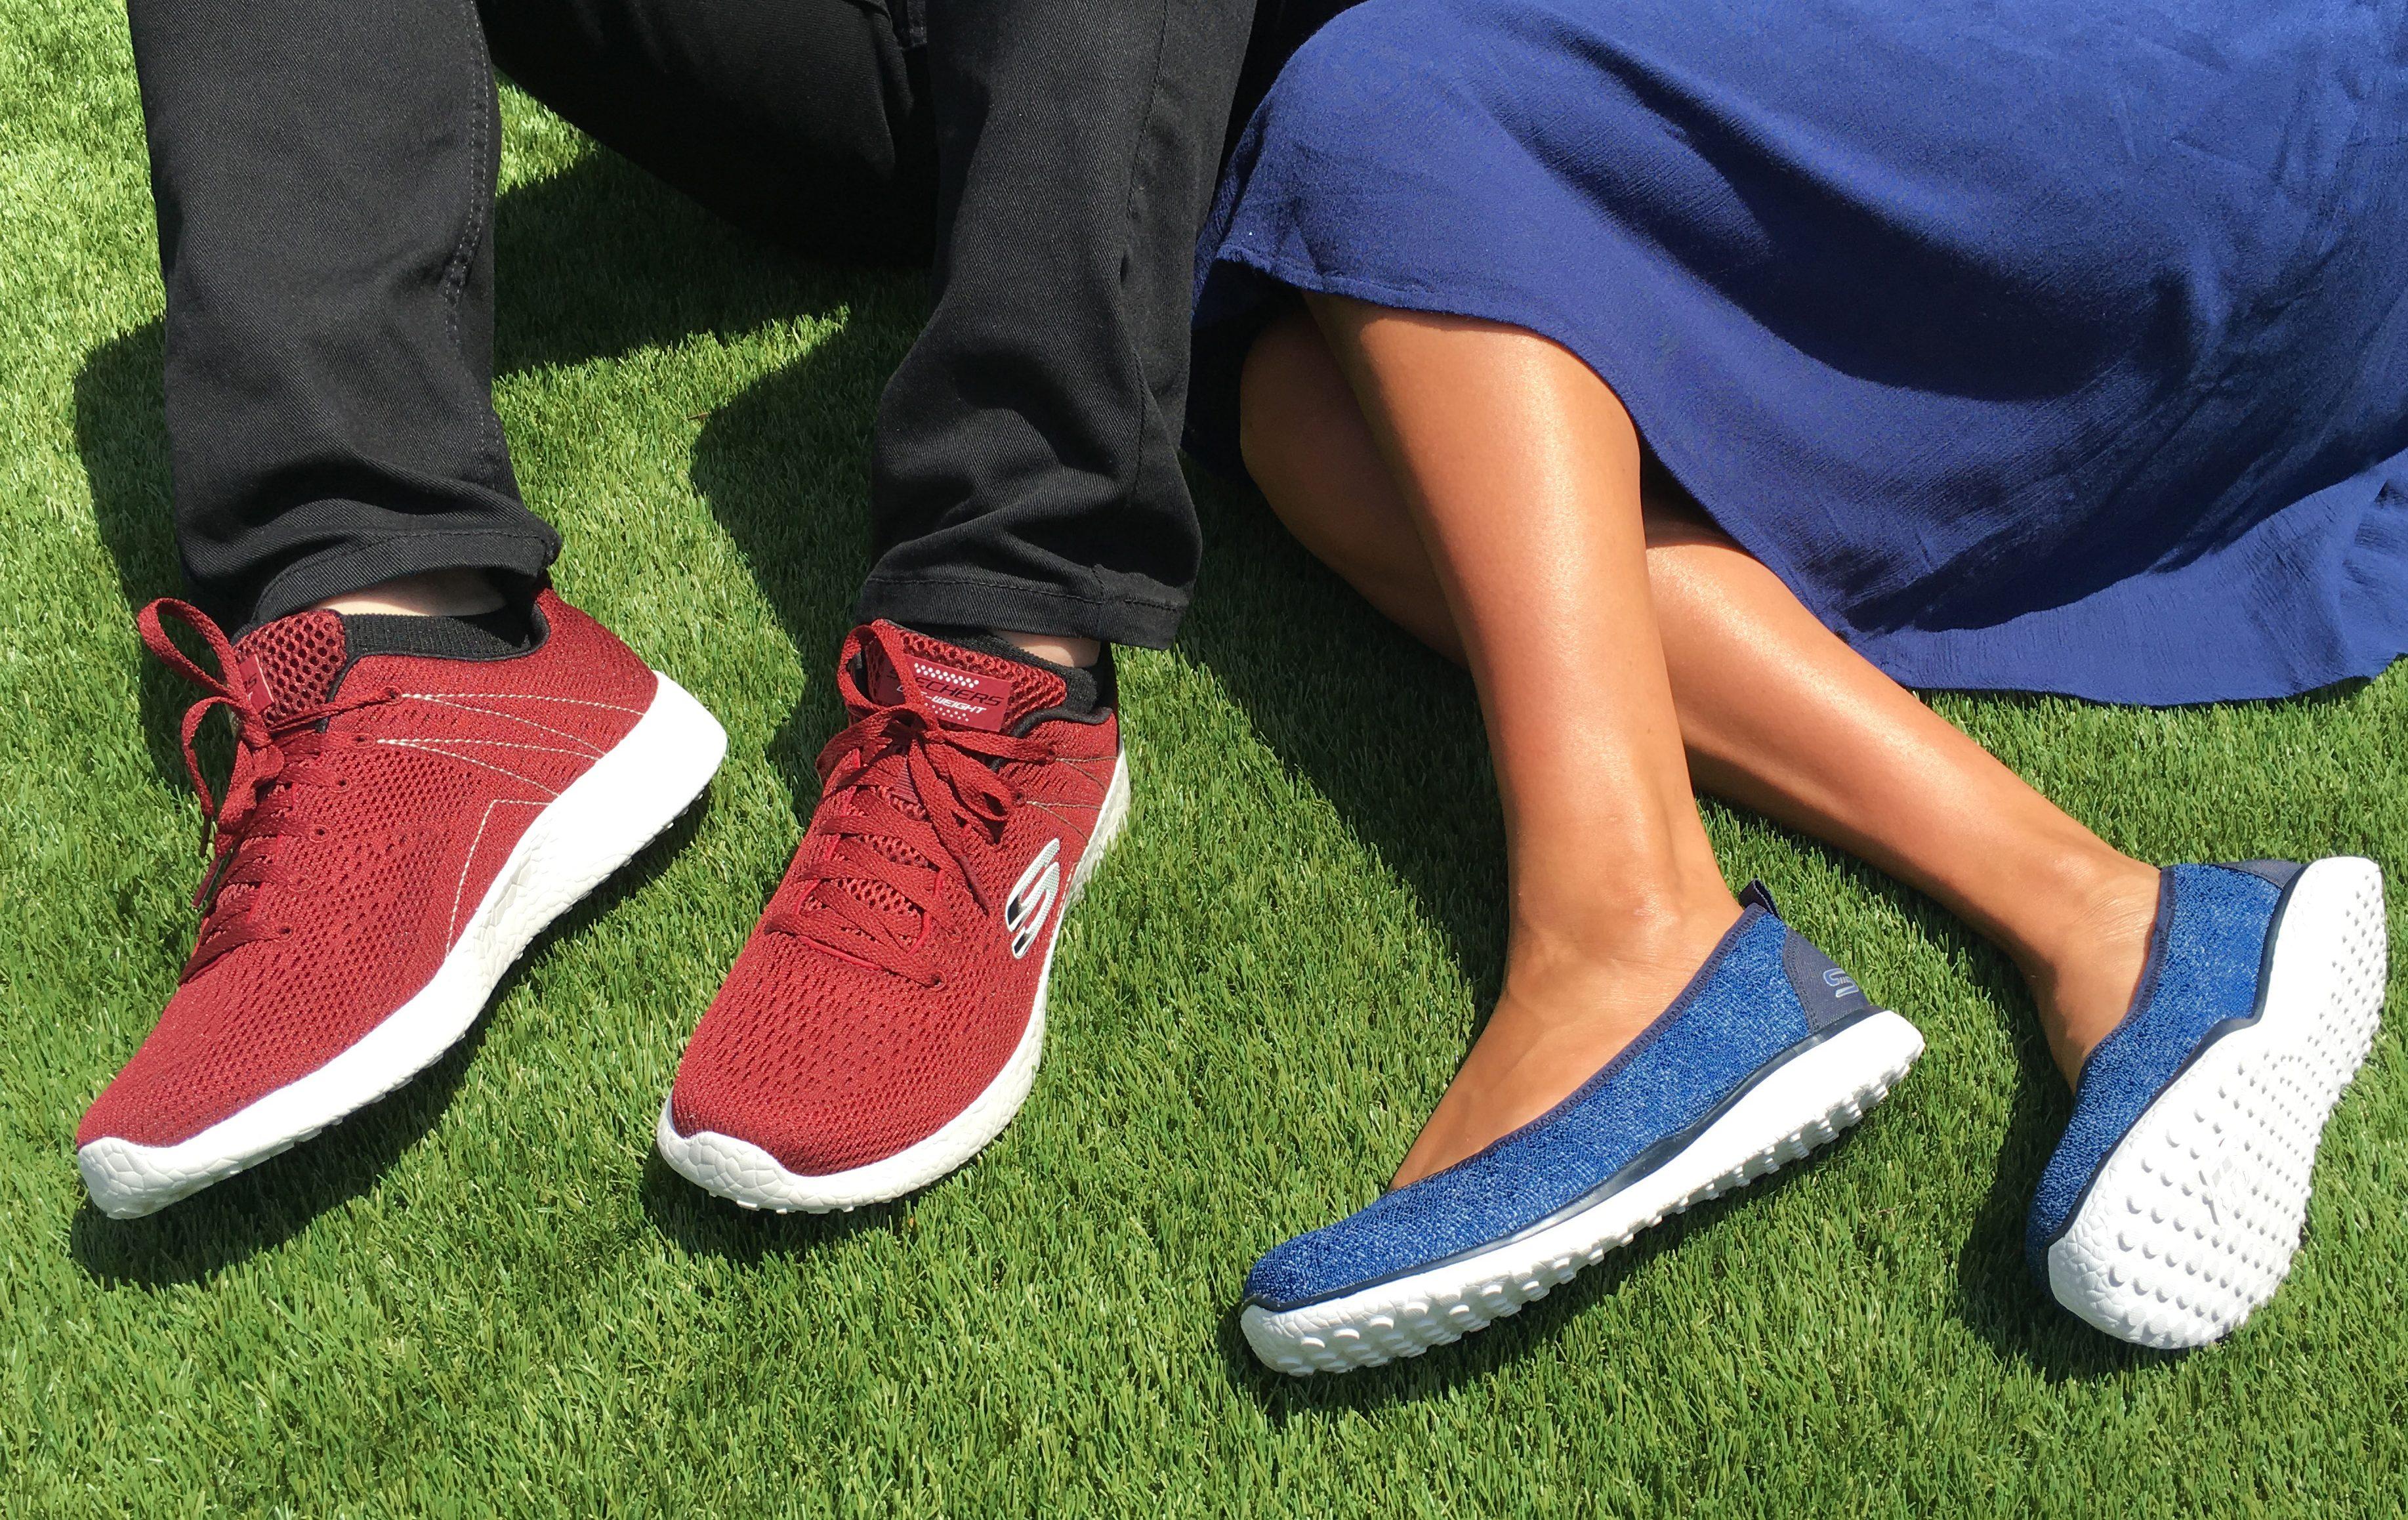 microburst one up fashion sneaker cheap